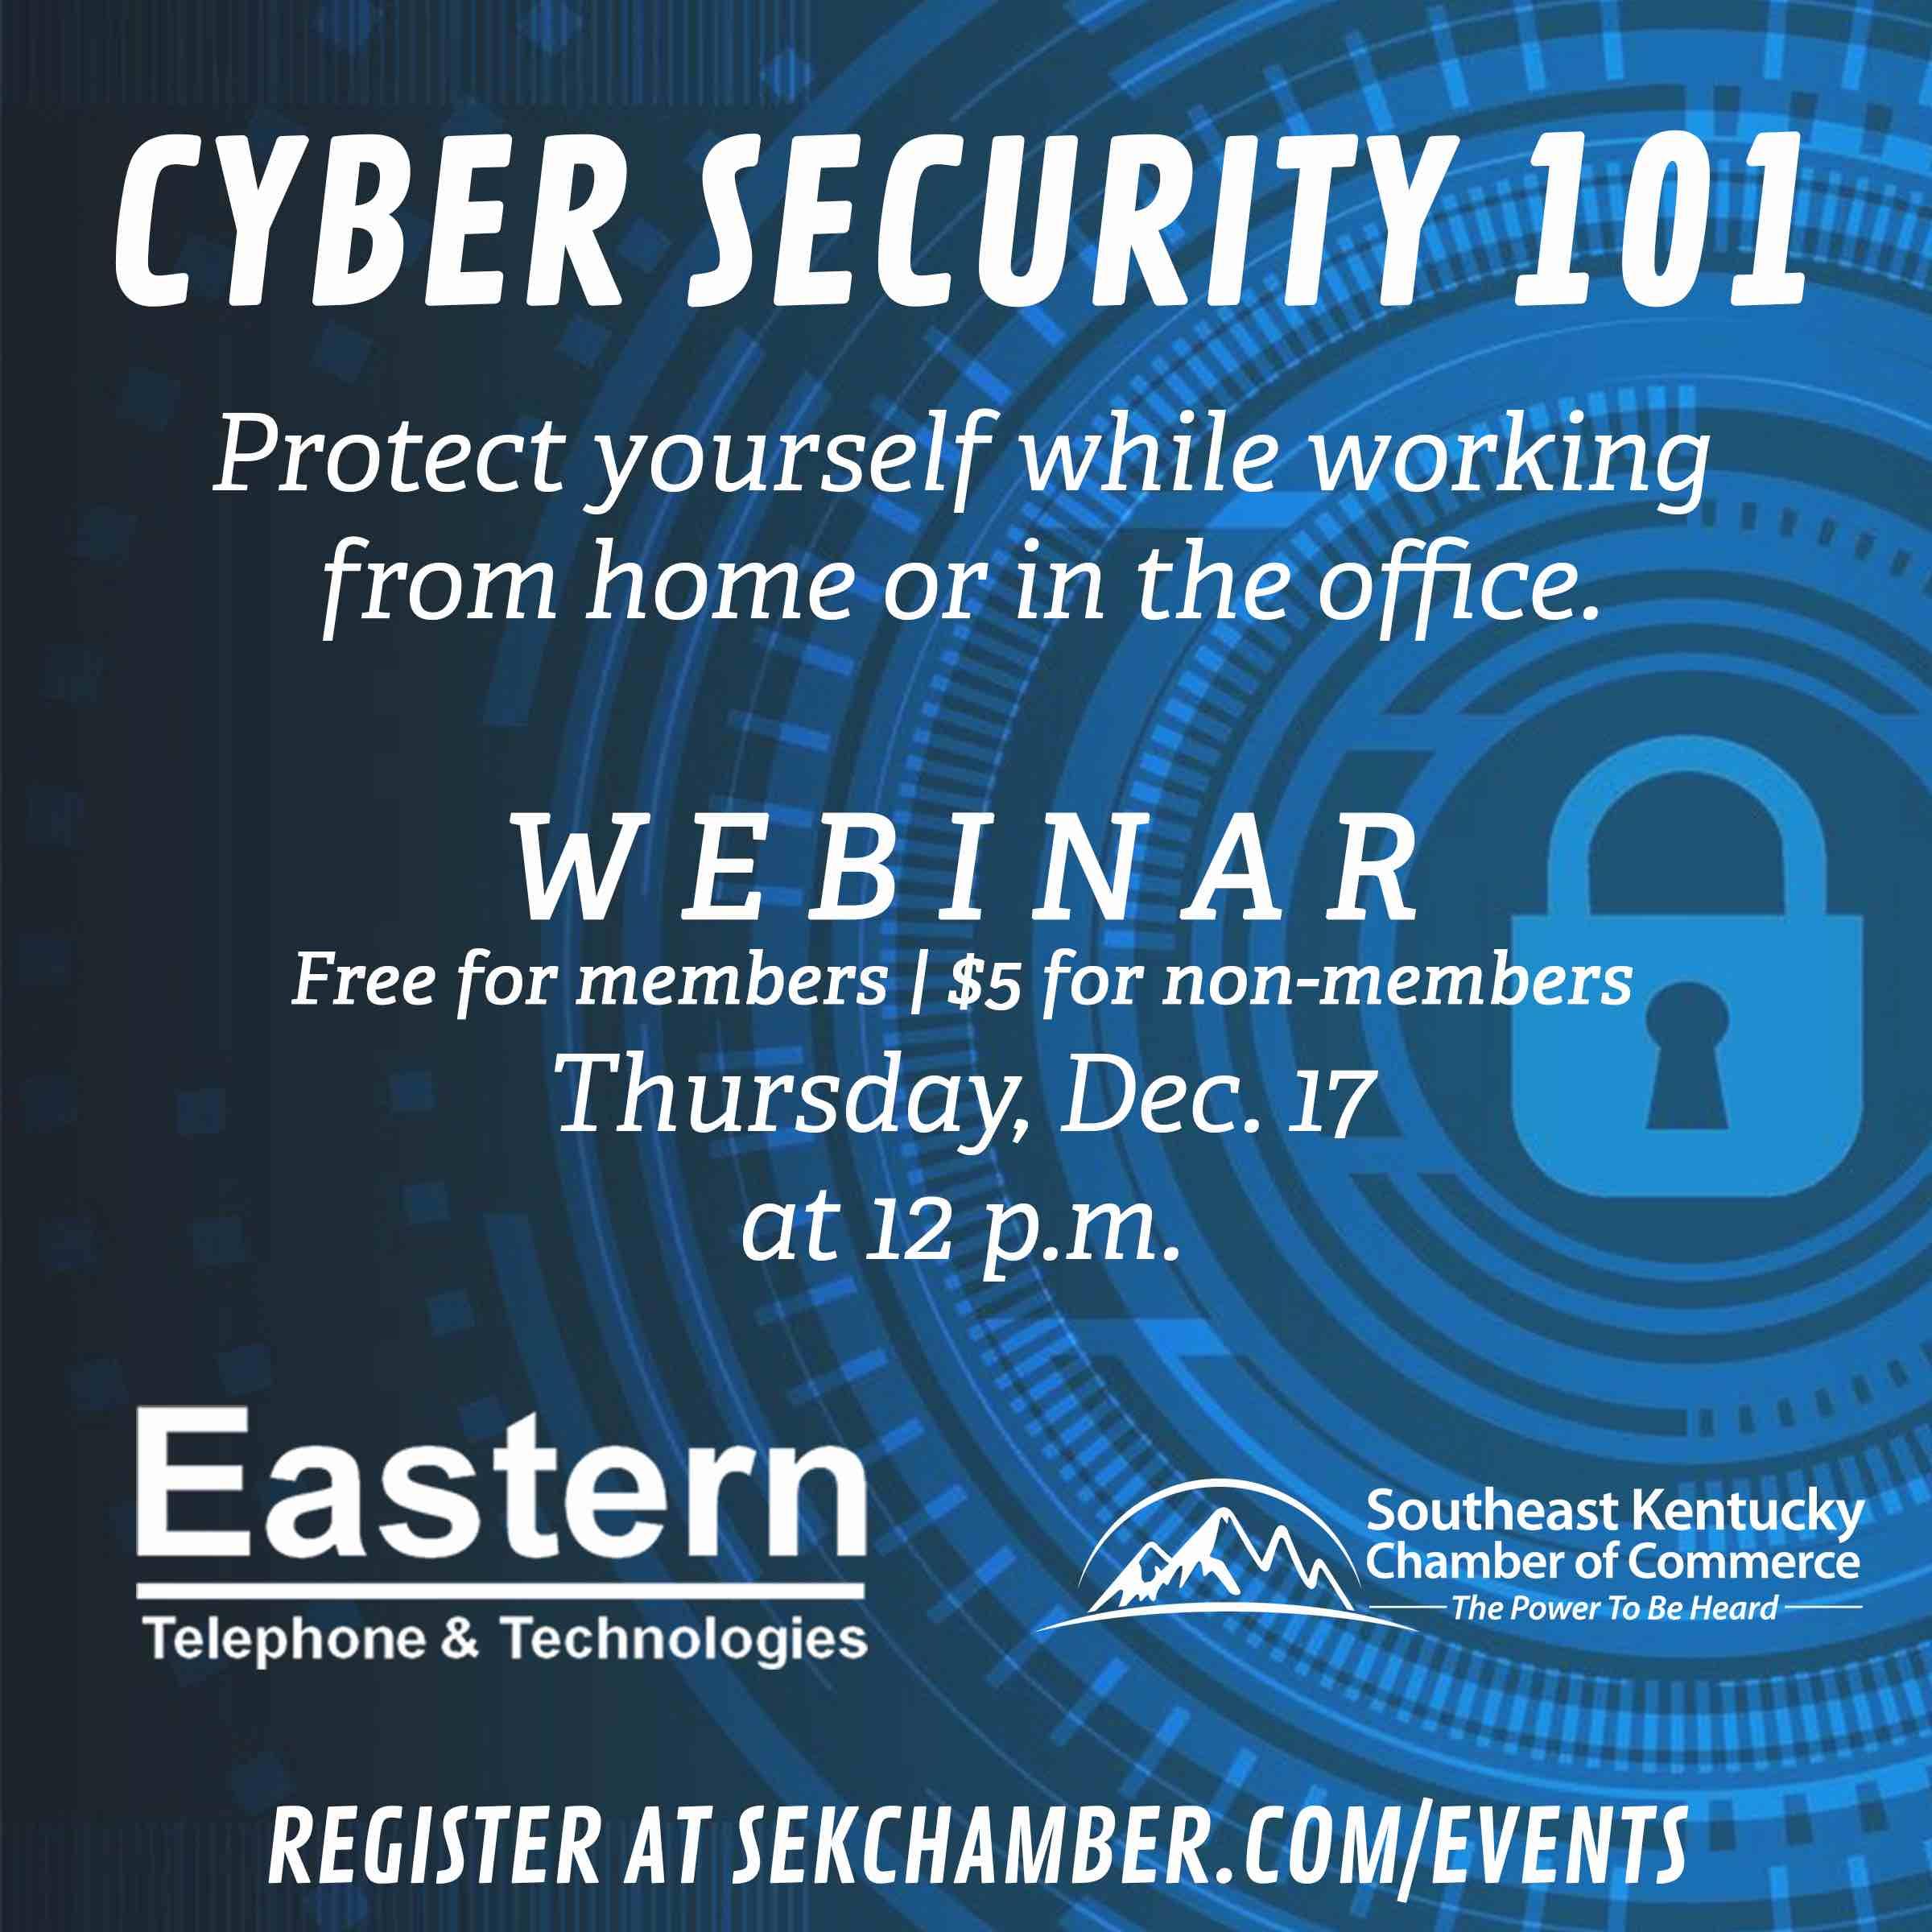 Cyber Security 101 Webinar